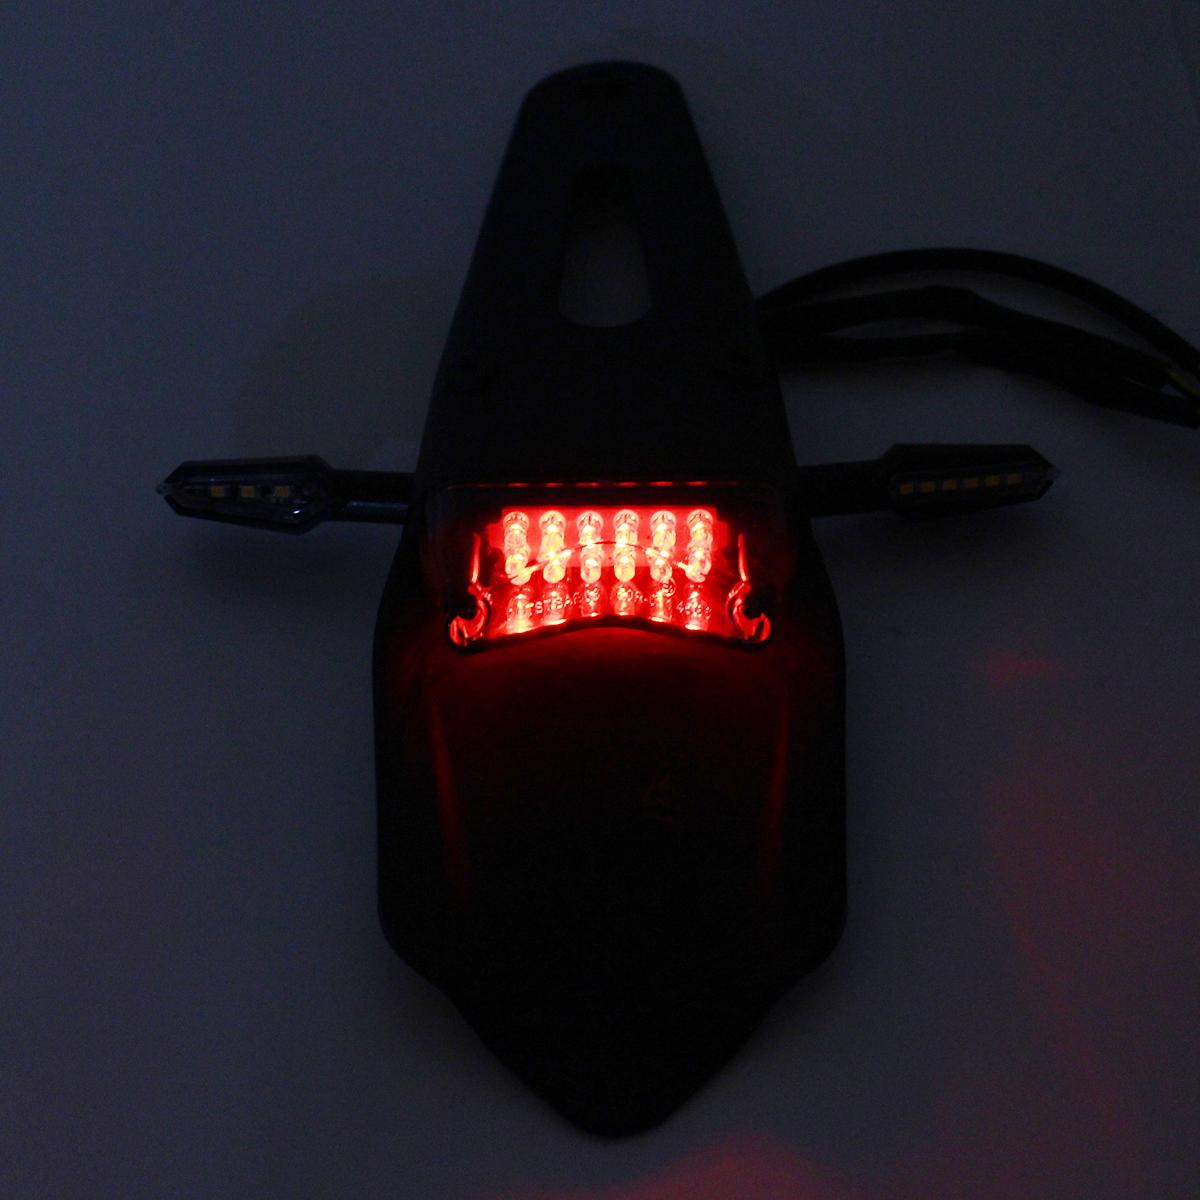 12V Universal Motorcycle Enduro LED Rear Fender-Brake Tail Light With Turn Signals